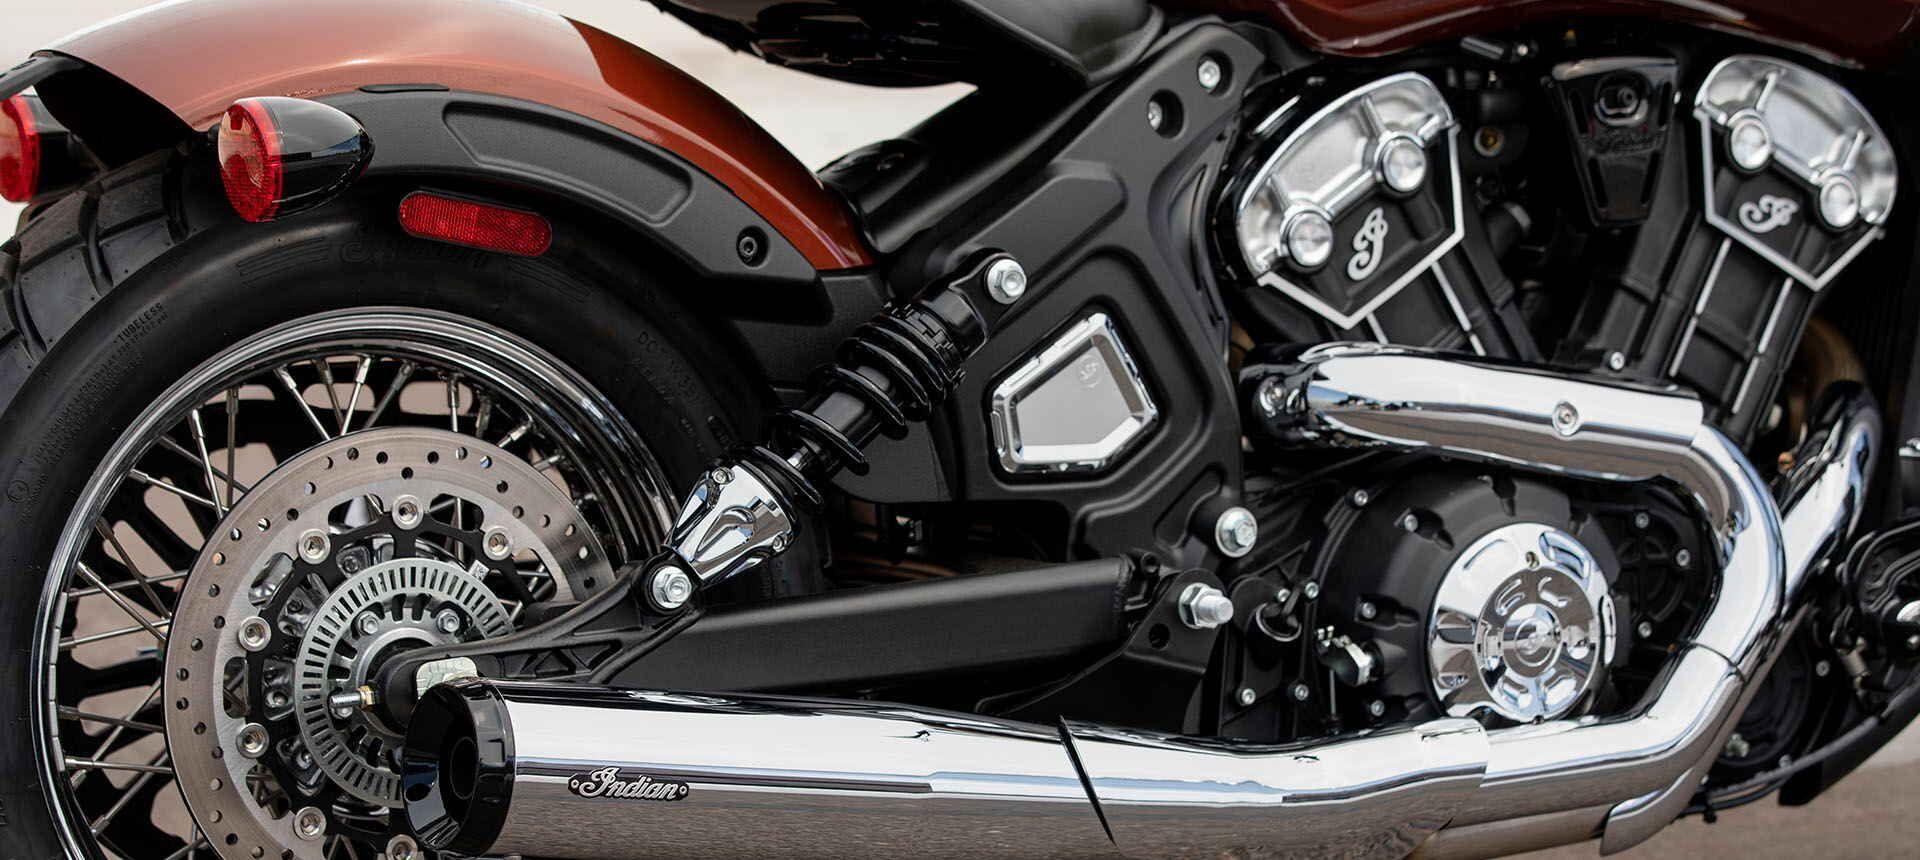 Мотоцикл Indian Scout Bobber Twenty Sagebrush Smoke 2020 - 7